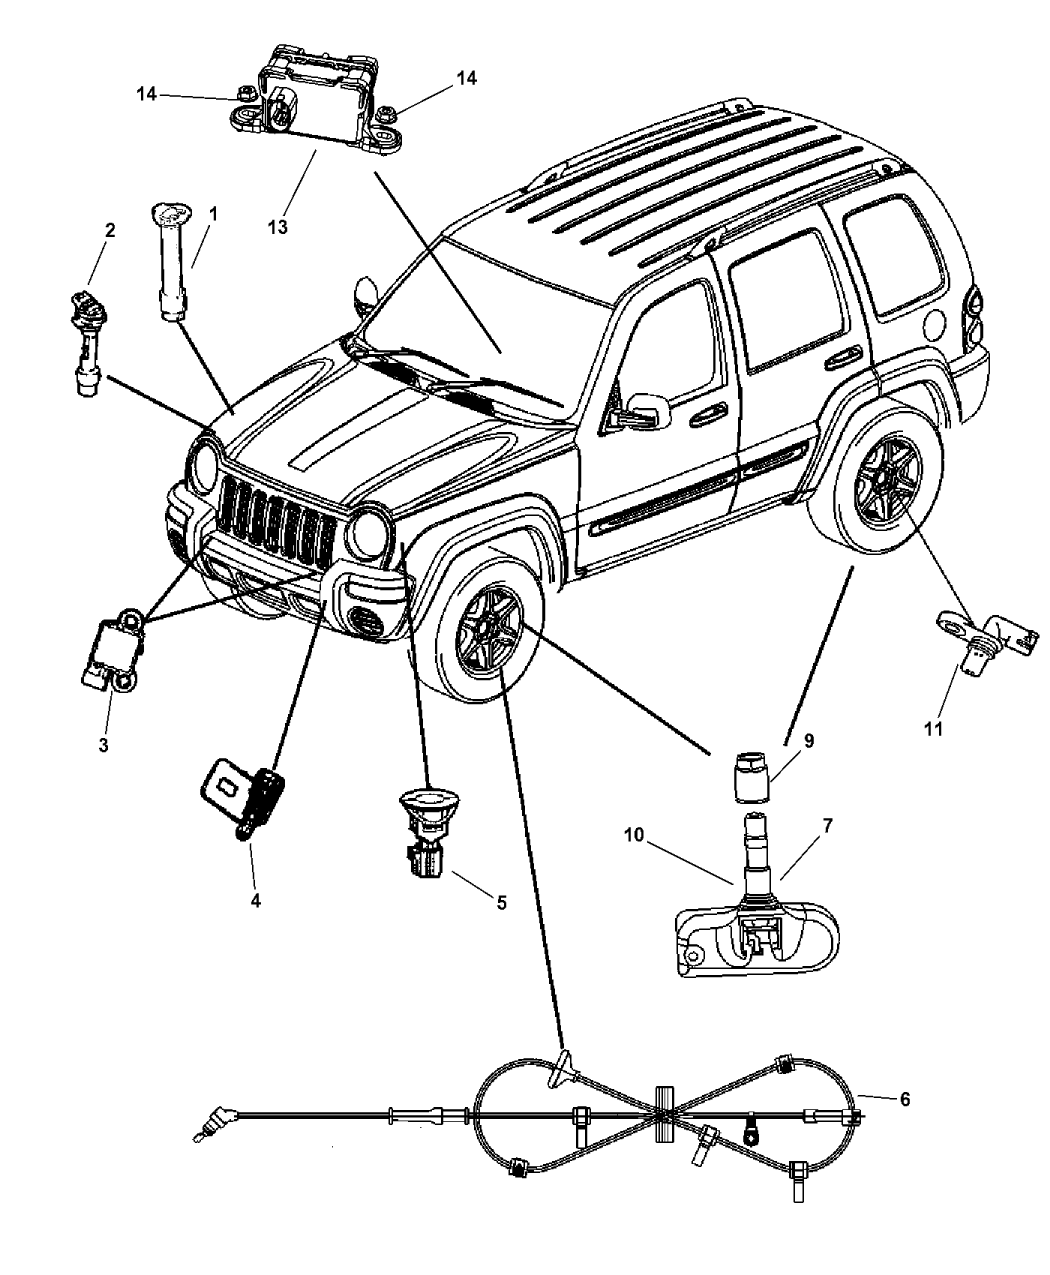 2006 Jeep Liberty Sensor (Body)